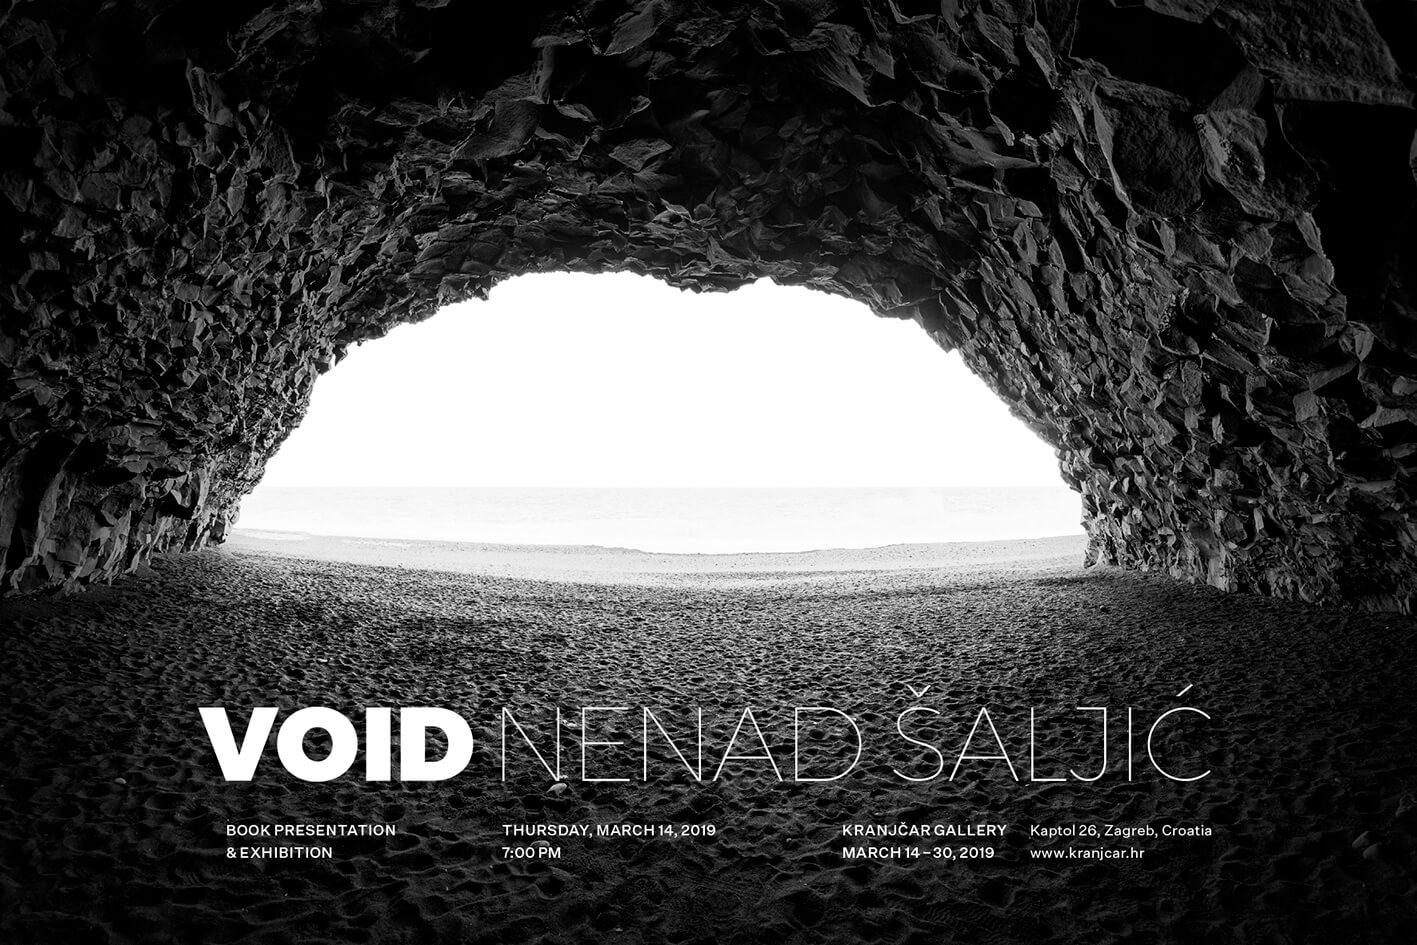 VOID Nenad Saljic-ENG